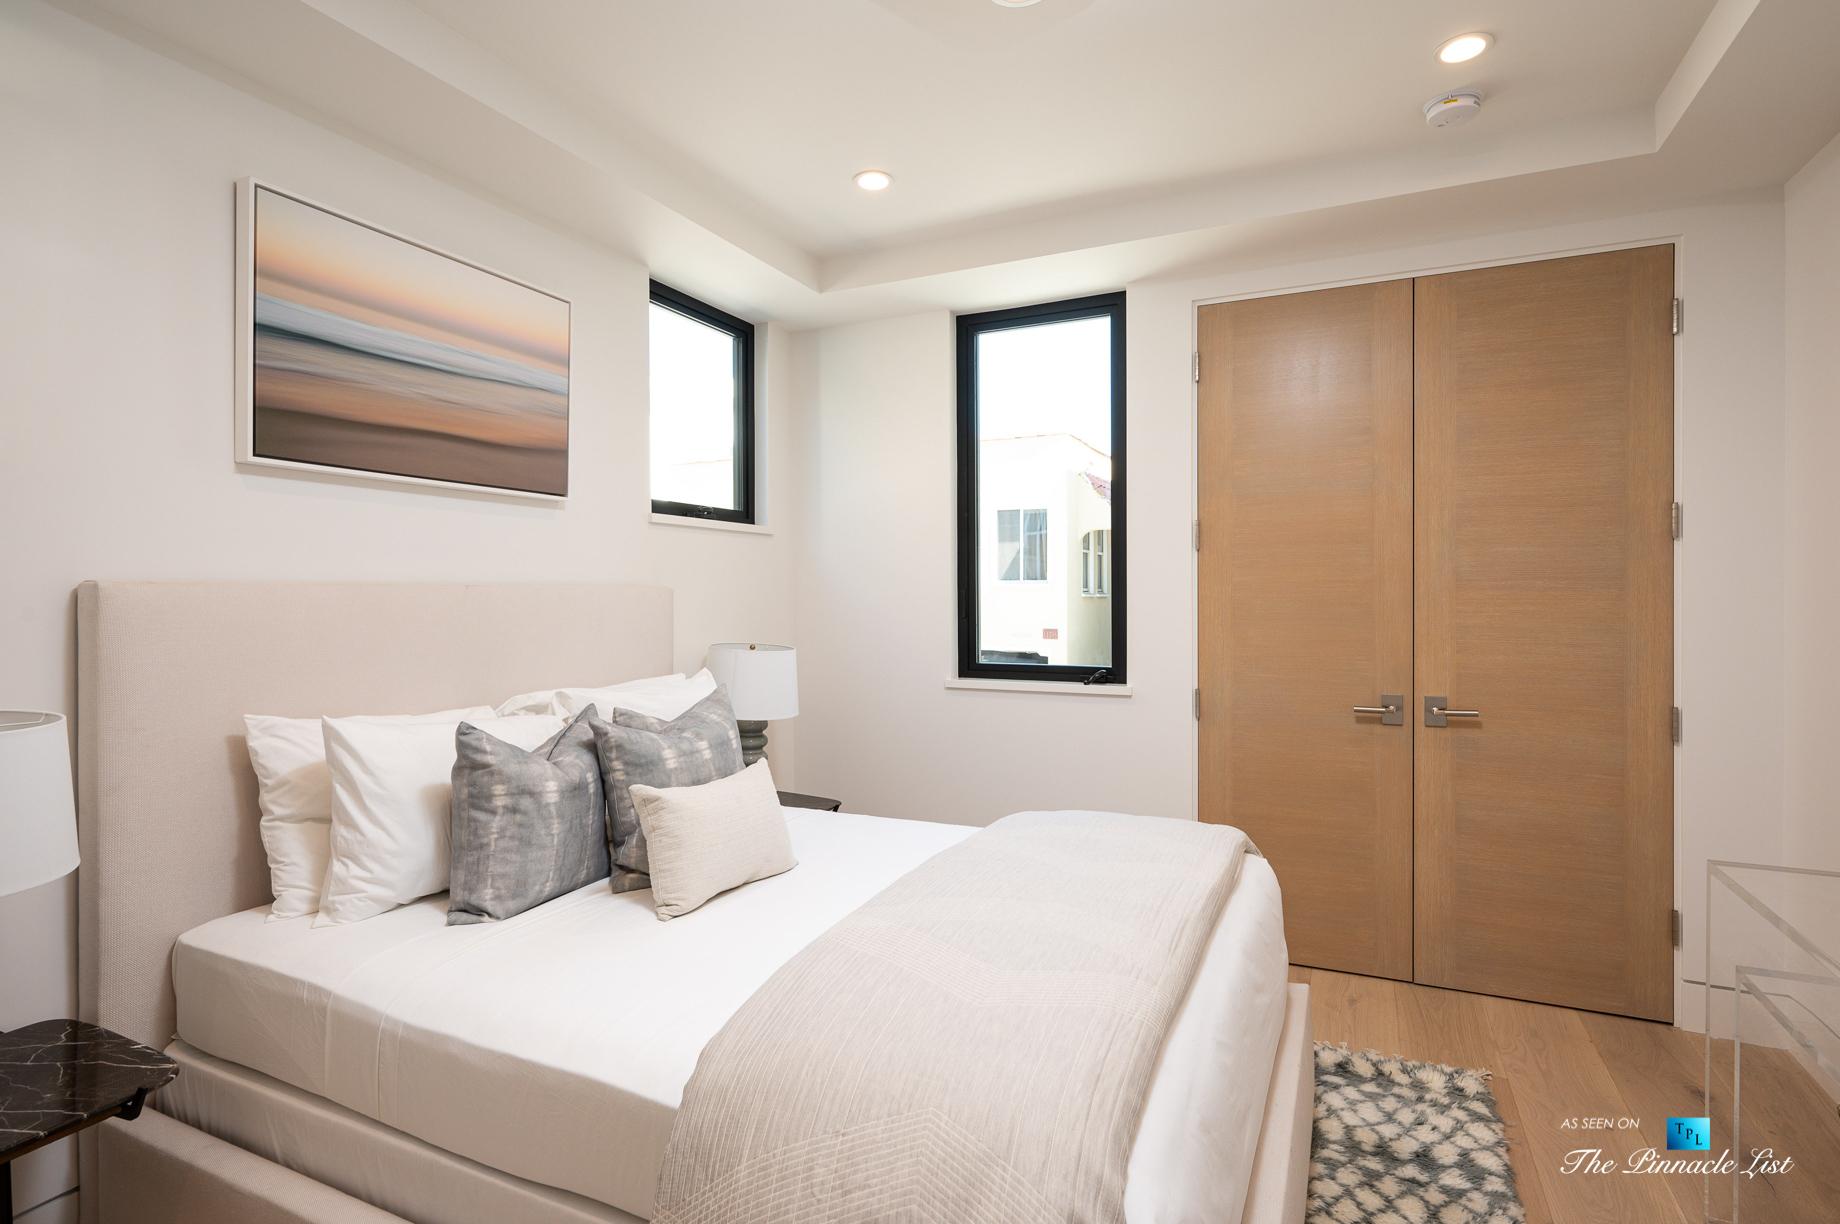 2016 Ocean Dr, Manhattan Beach, CA, USA - Bedroom - Luxury Real Estate - Modern Ocean View Home